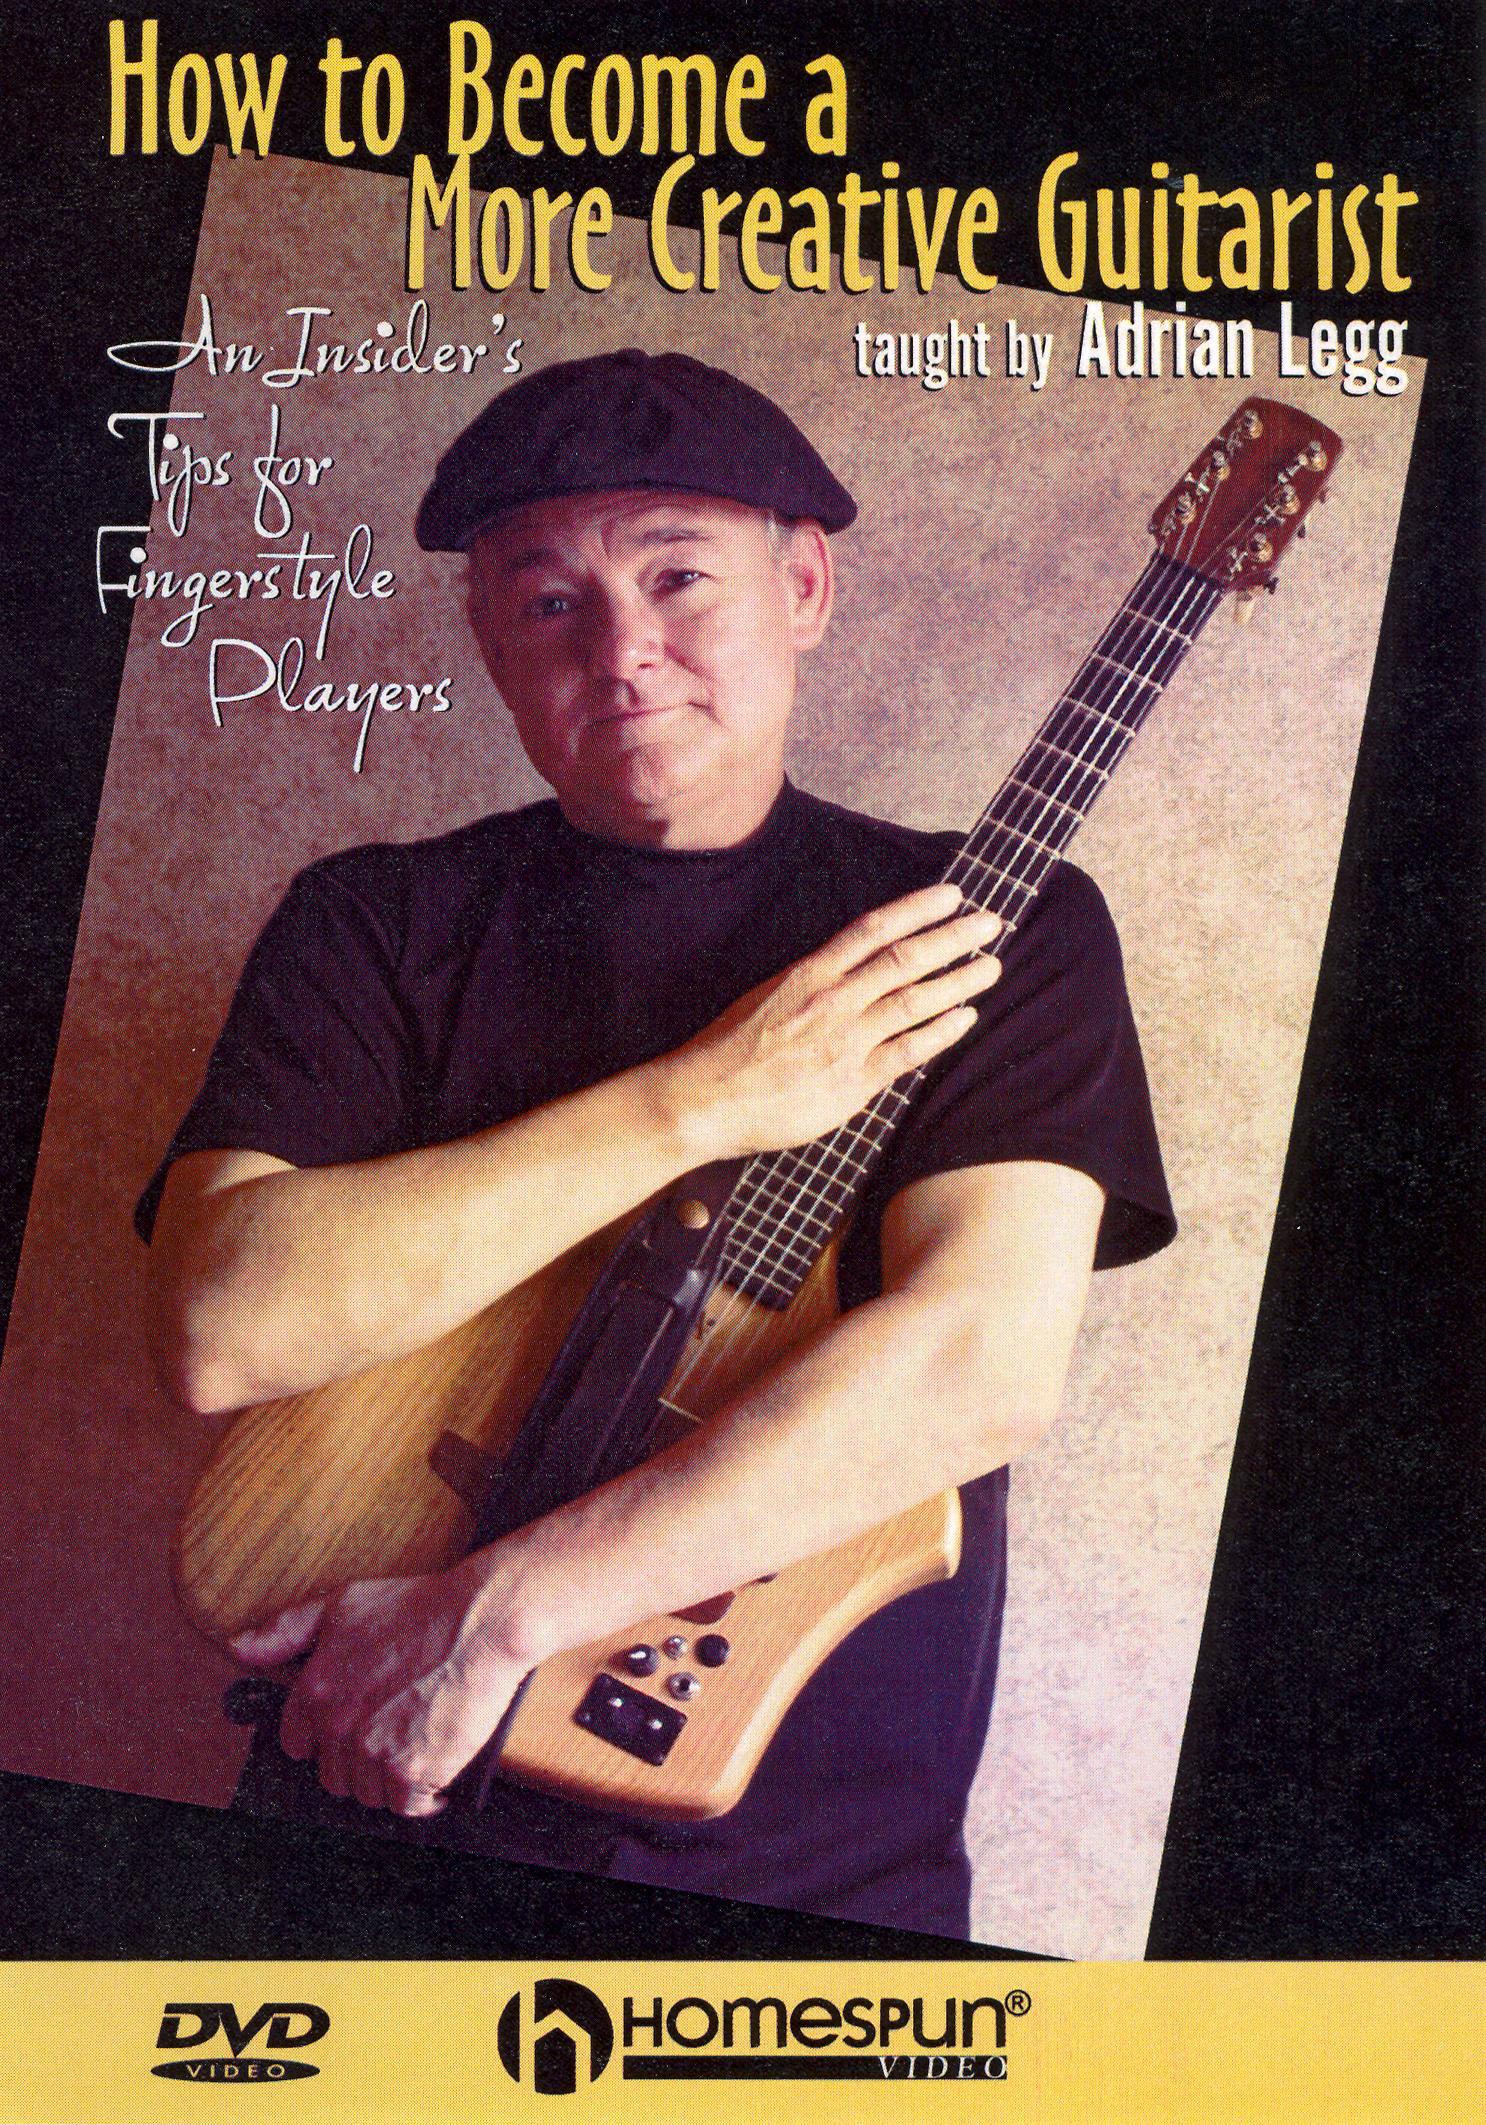 Adrian Legg: How to Become a More Creative Guitarist